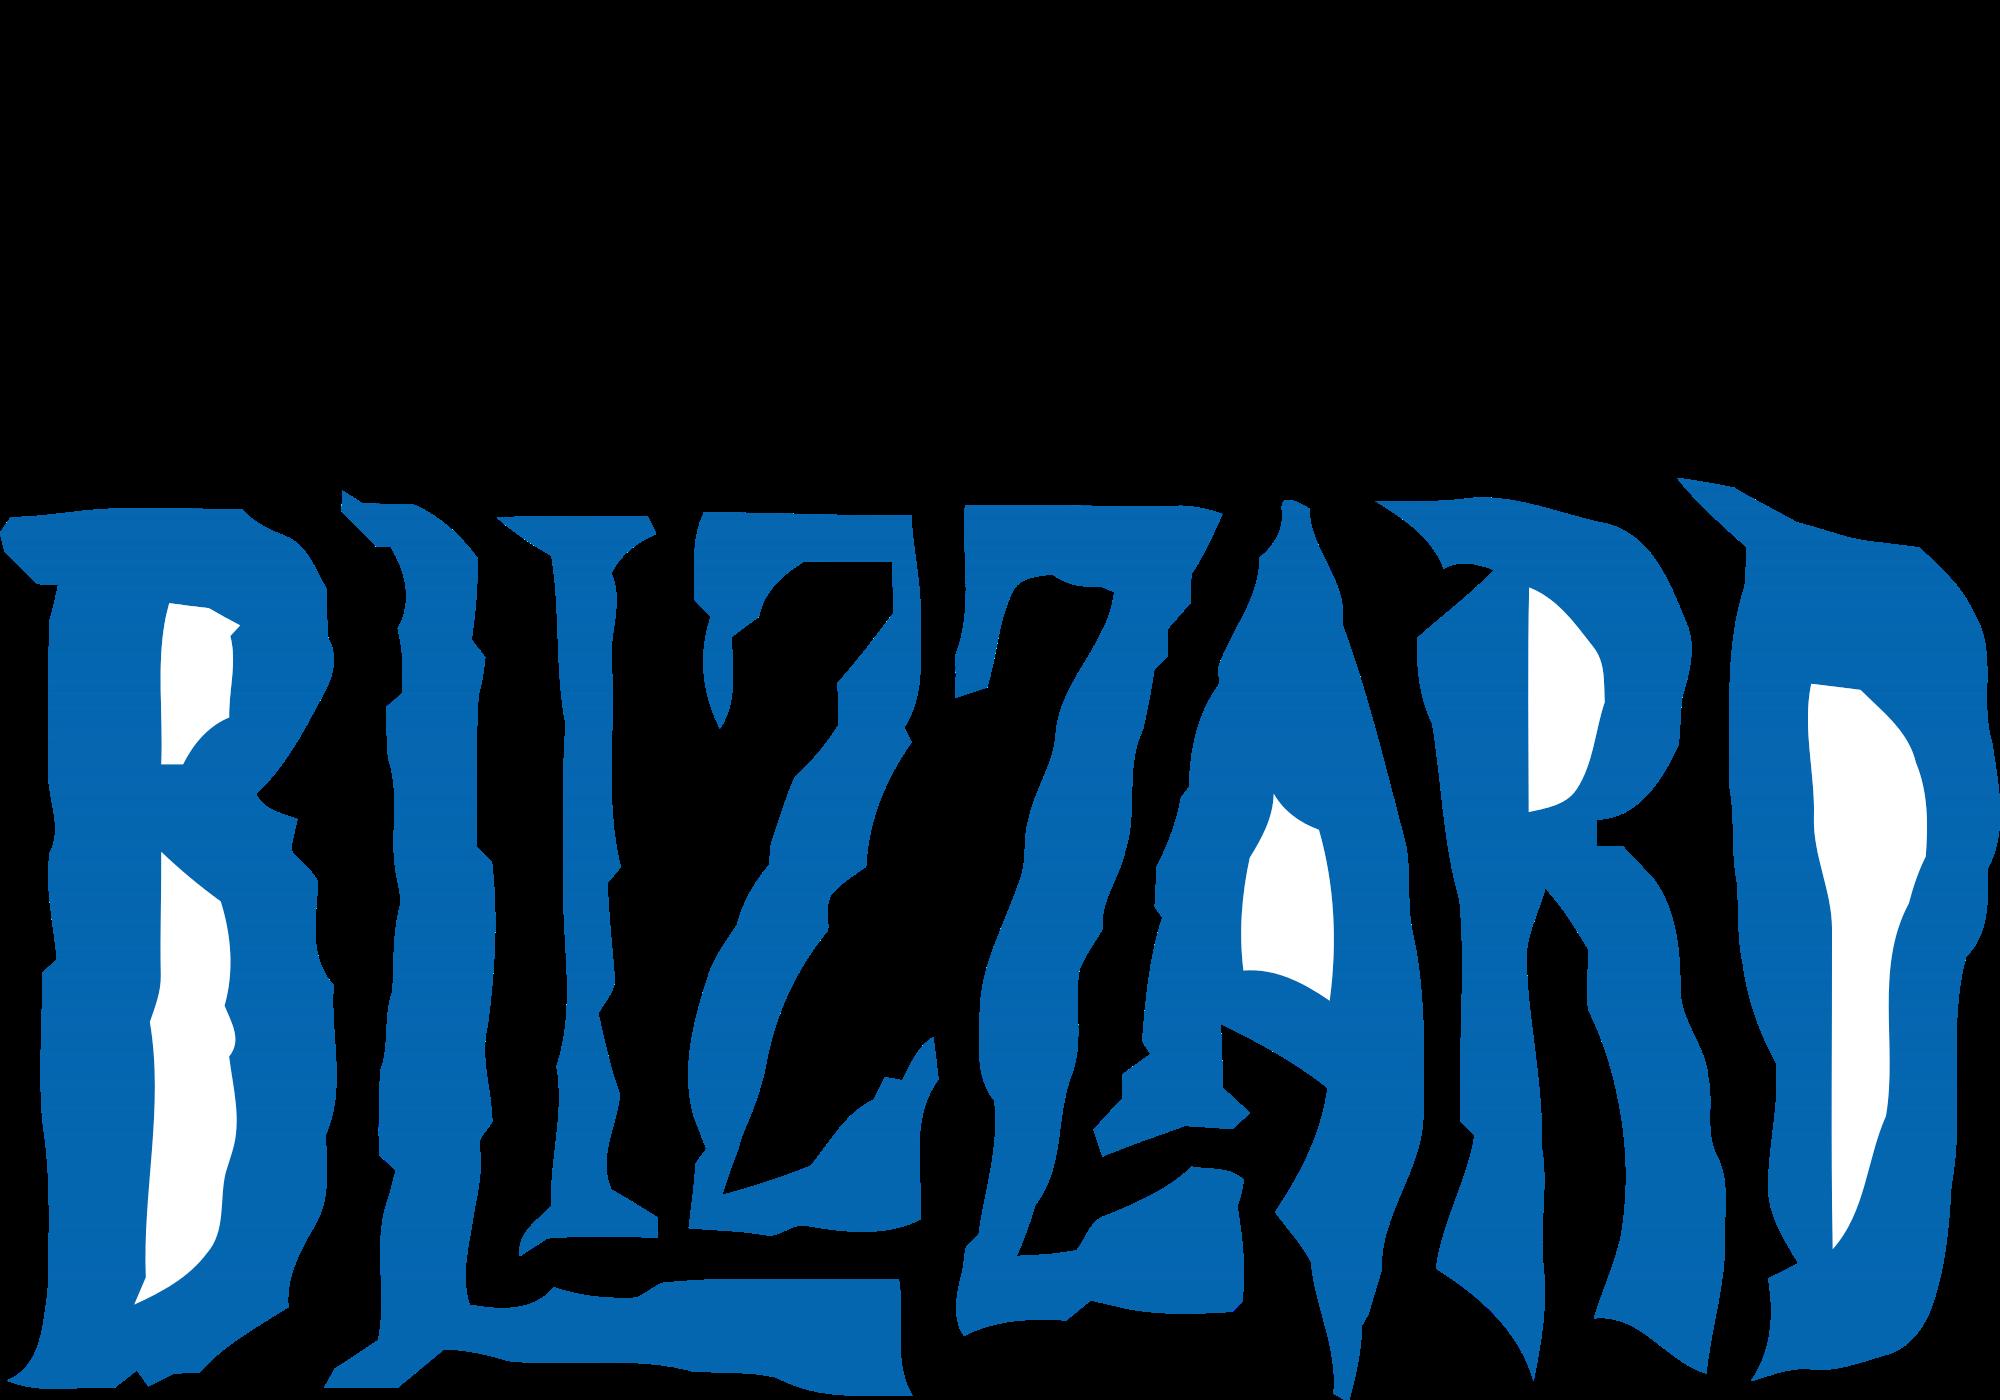 Logo Activision PNG - 97378